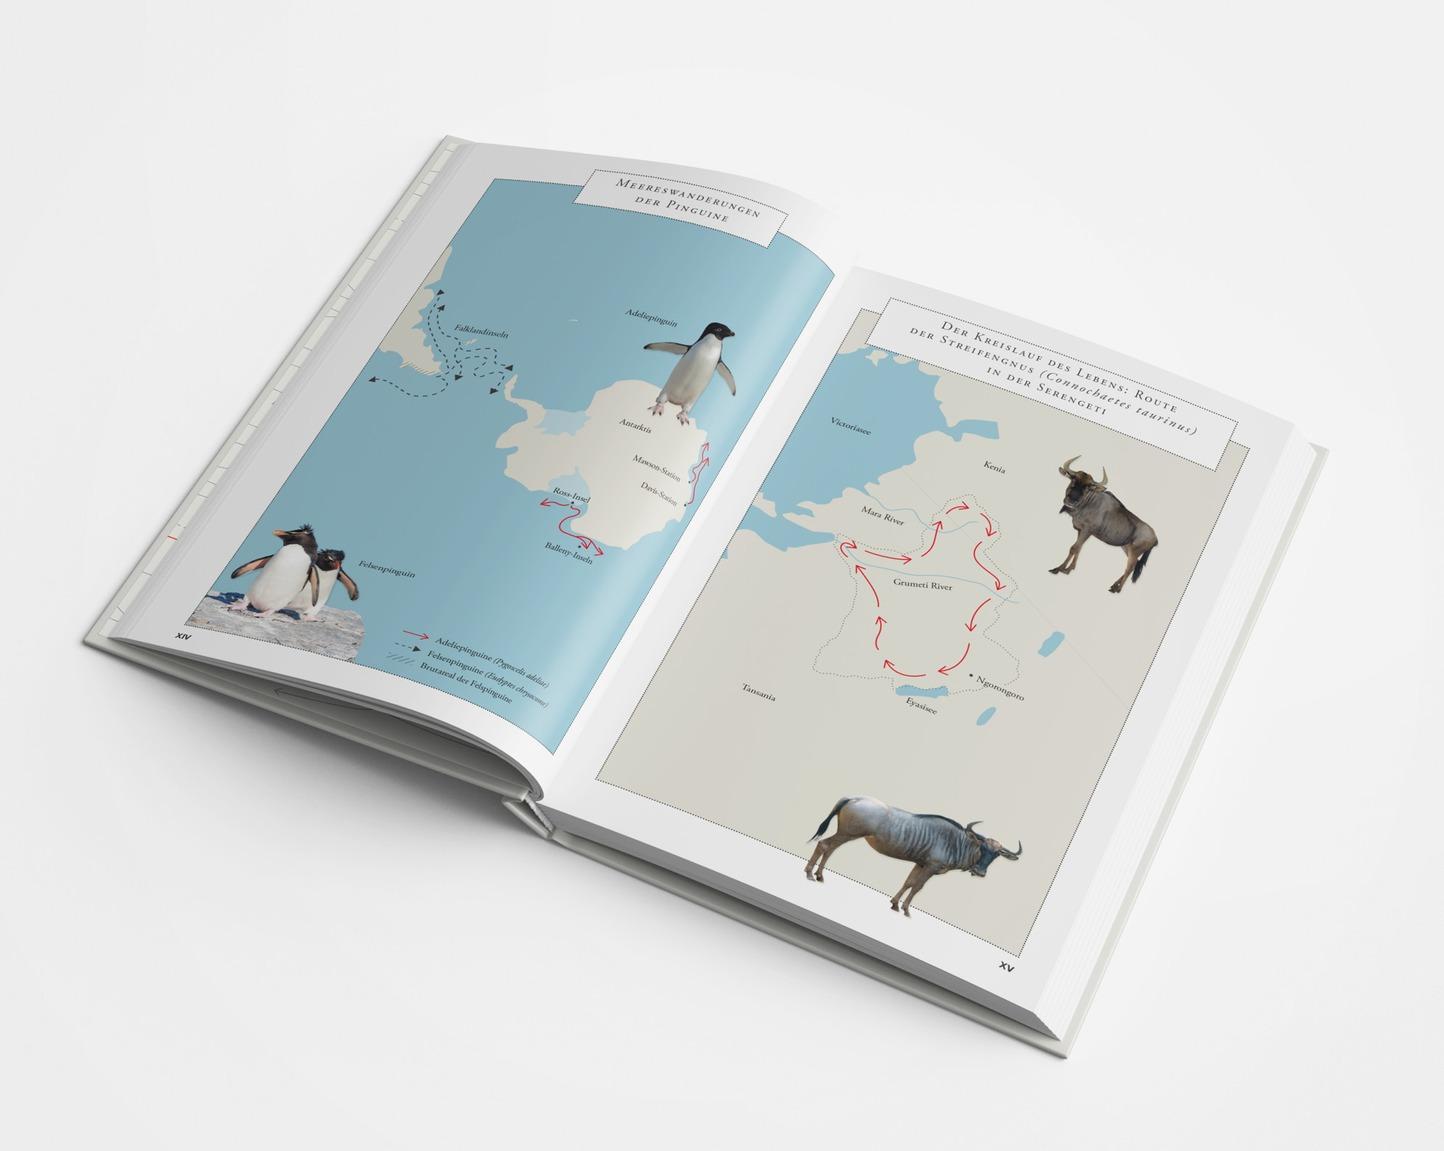 Mappe / Maps